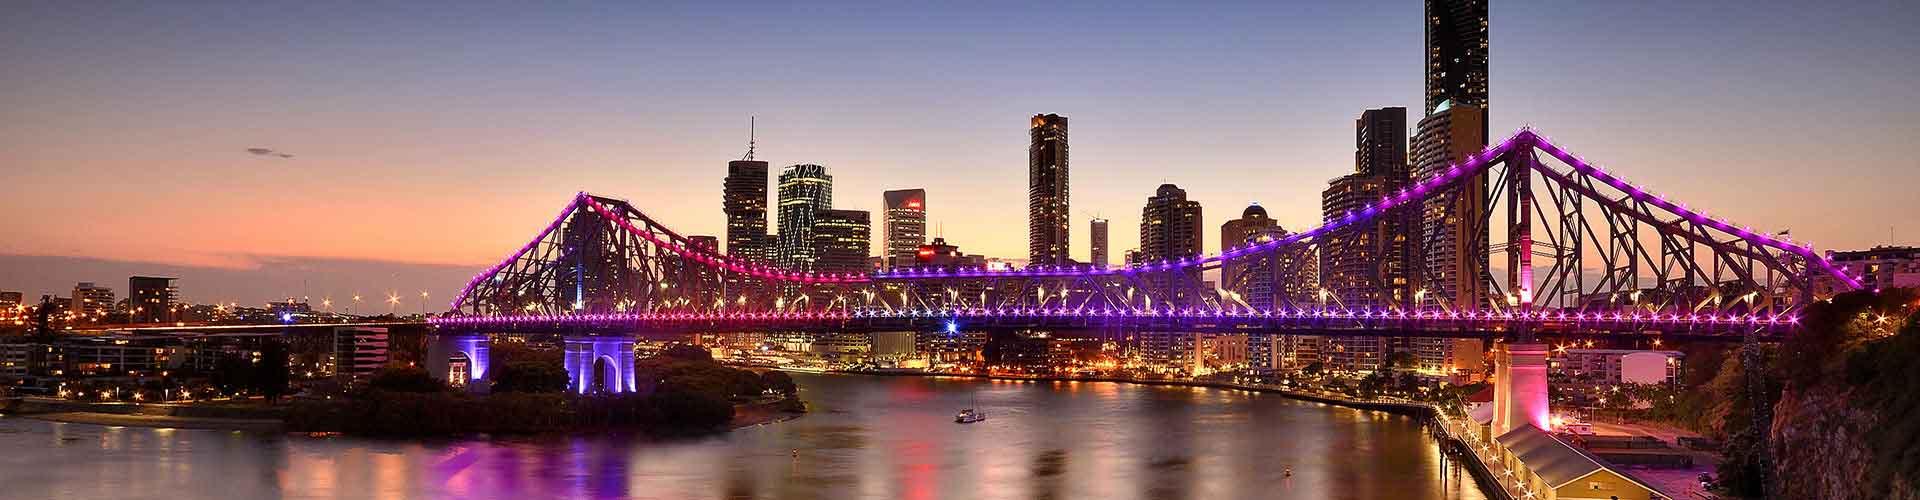 Brisbane – Retkeily kaupungiosassa Fortitude Valley. Brisbane -karttoja, valokuvia ja arvosteluja kaikista Brisbane -retkeilyalueista.